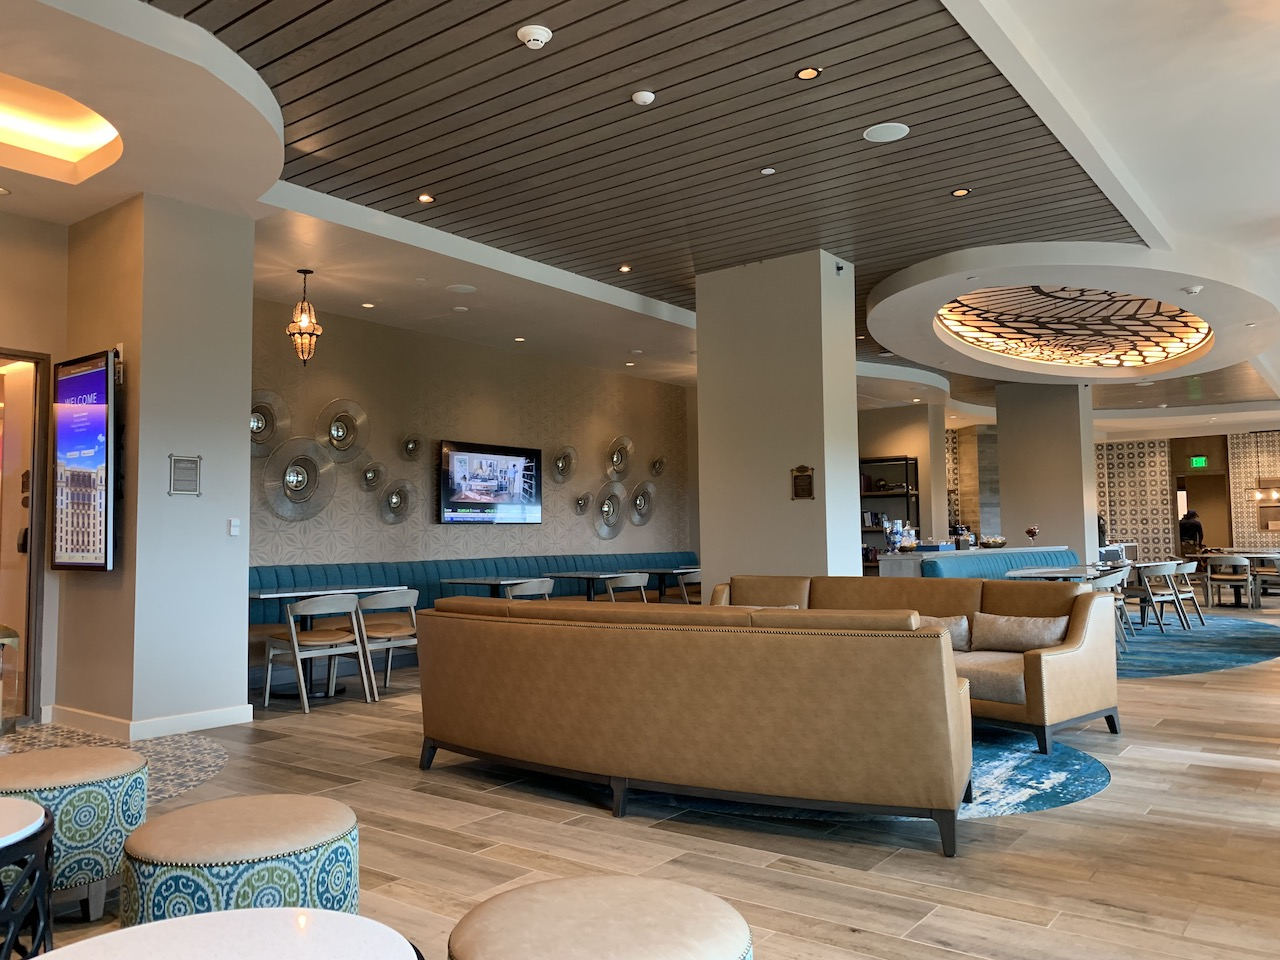 disney world club level concierge gran destino chronos lounge.jpeg